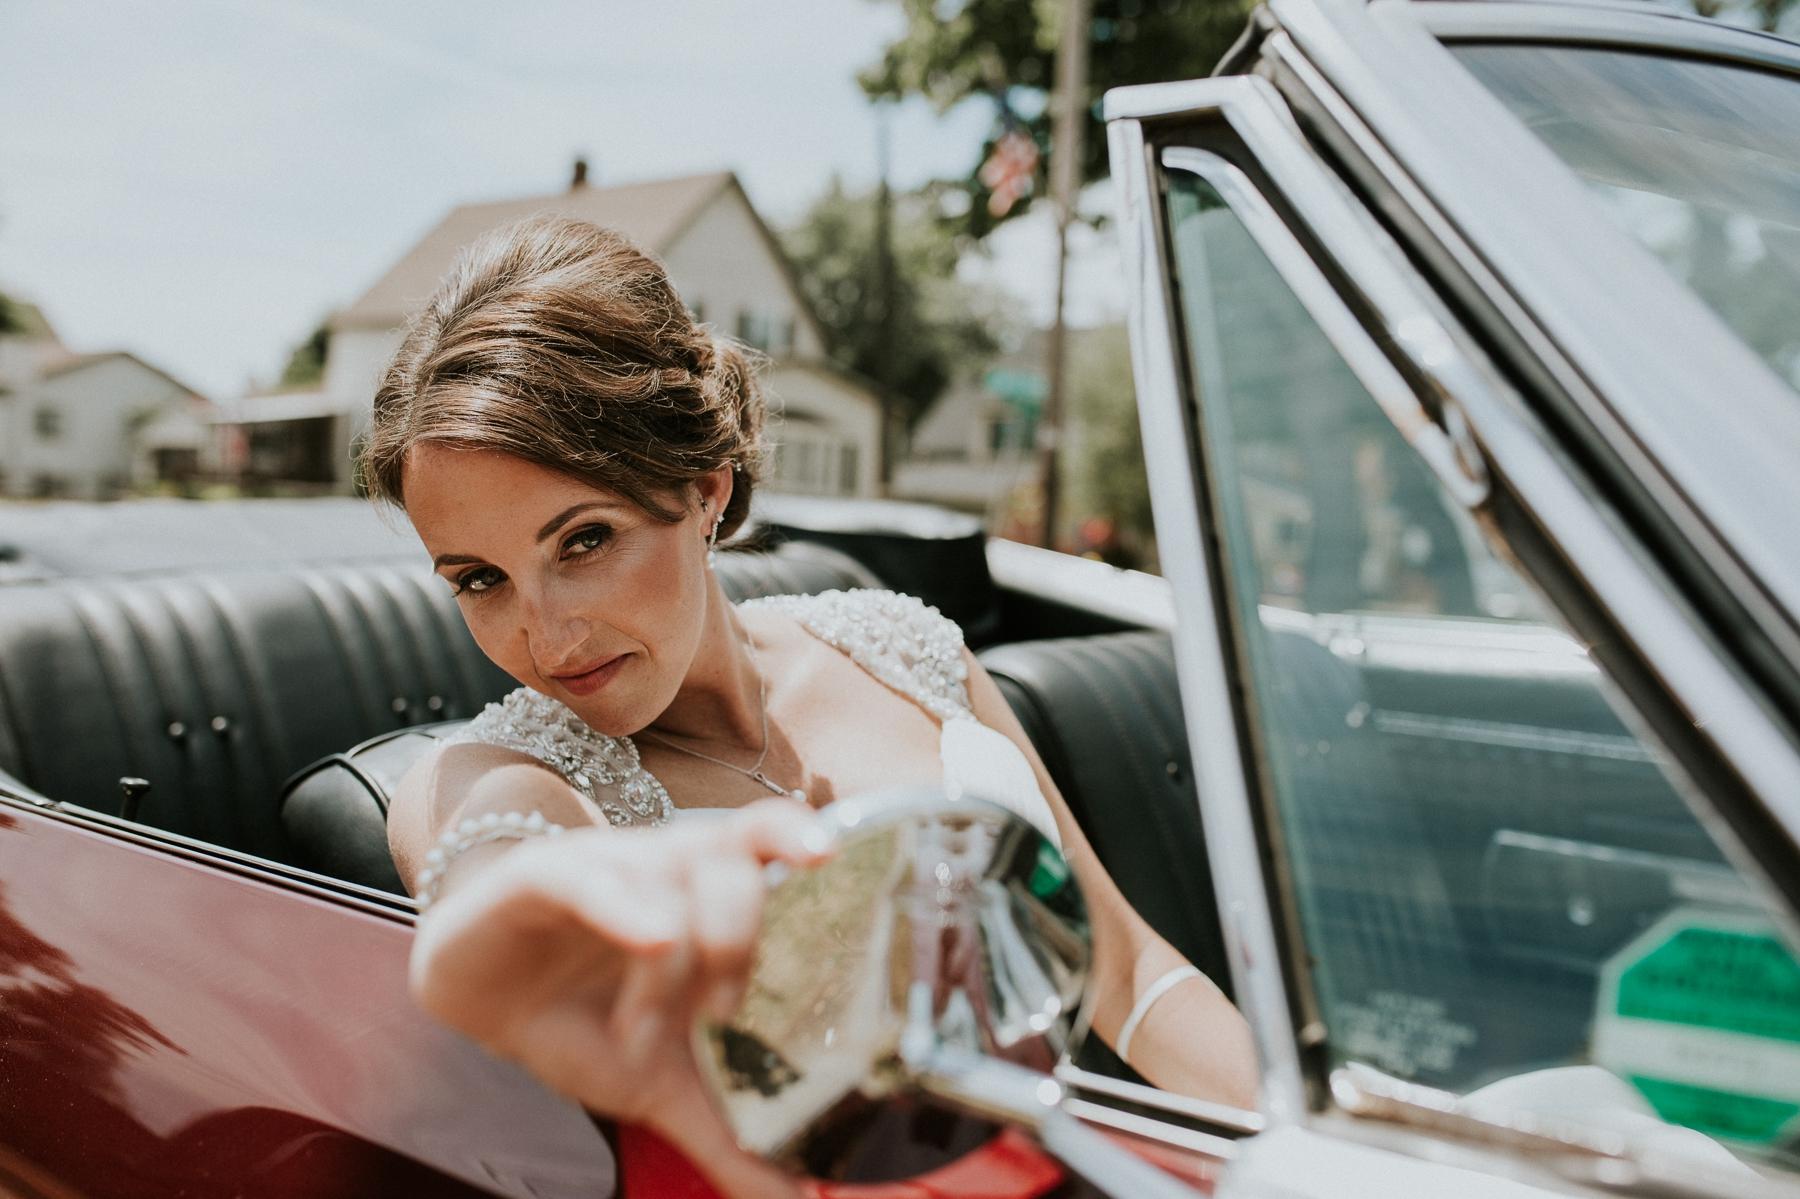 buffalo-new-york-hamburg-beach-wedding-photography 36.jpg